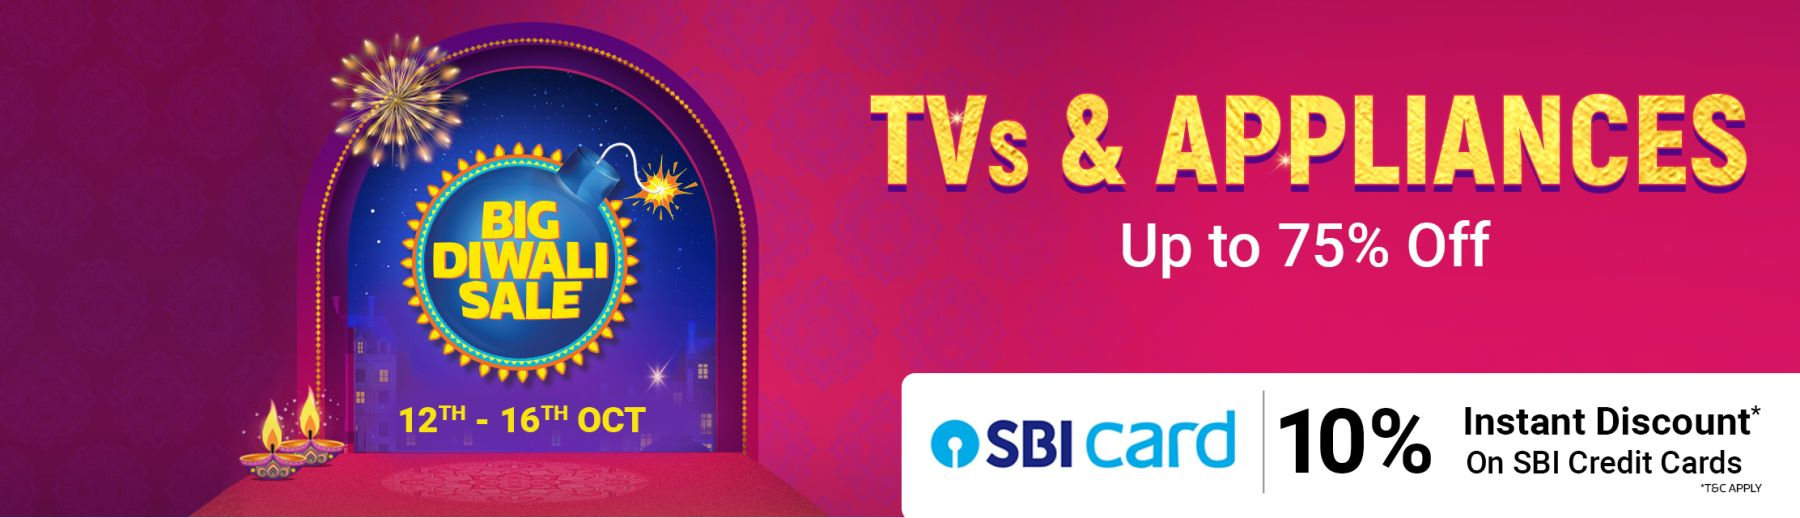 Flipkart-Big-Diwali-Sale-TvsAppliances-Upto-75OFF-2019